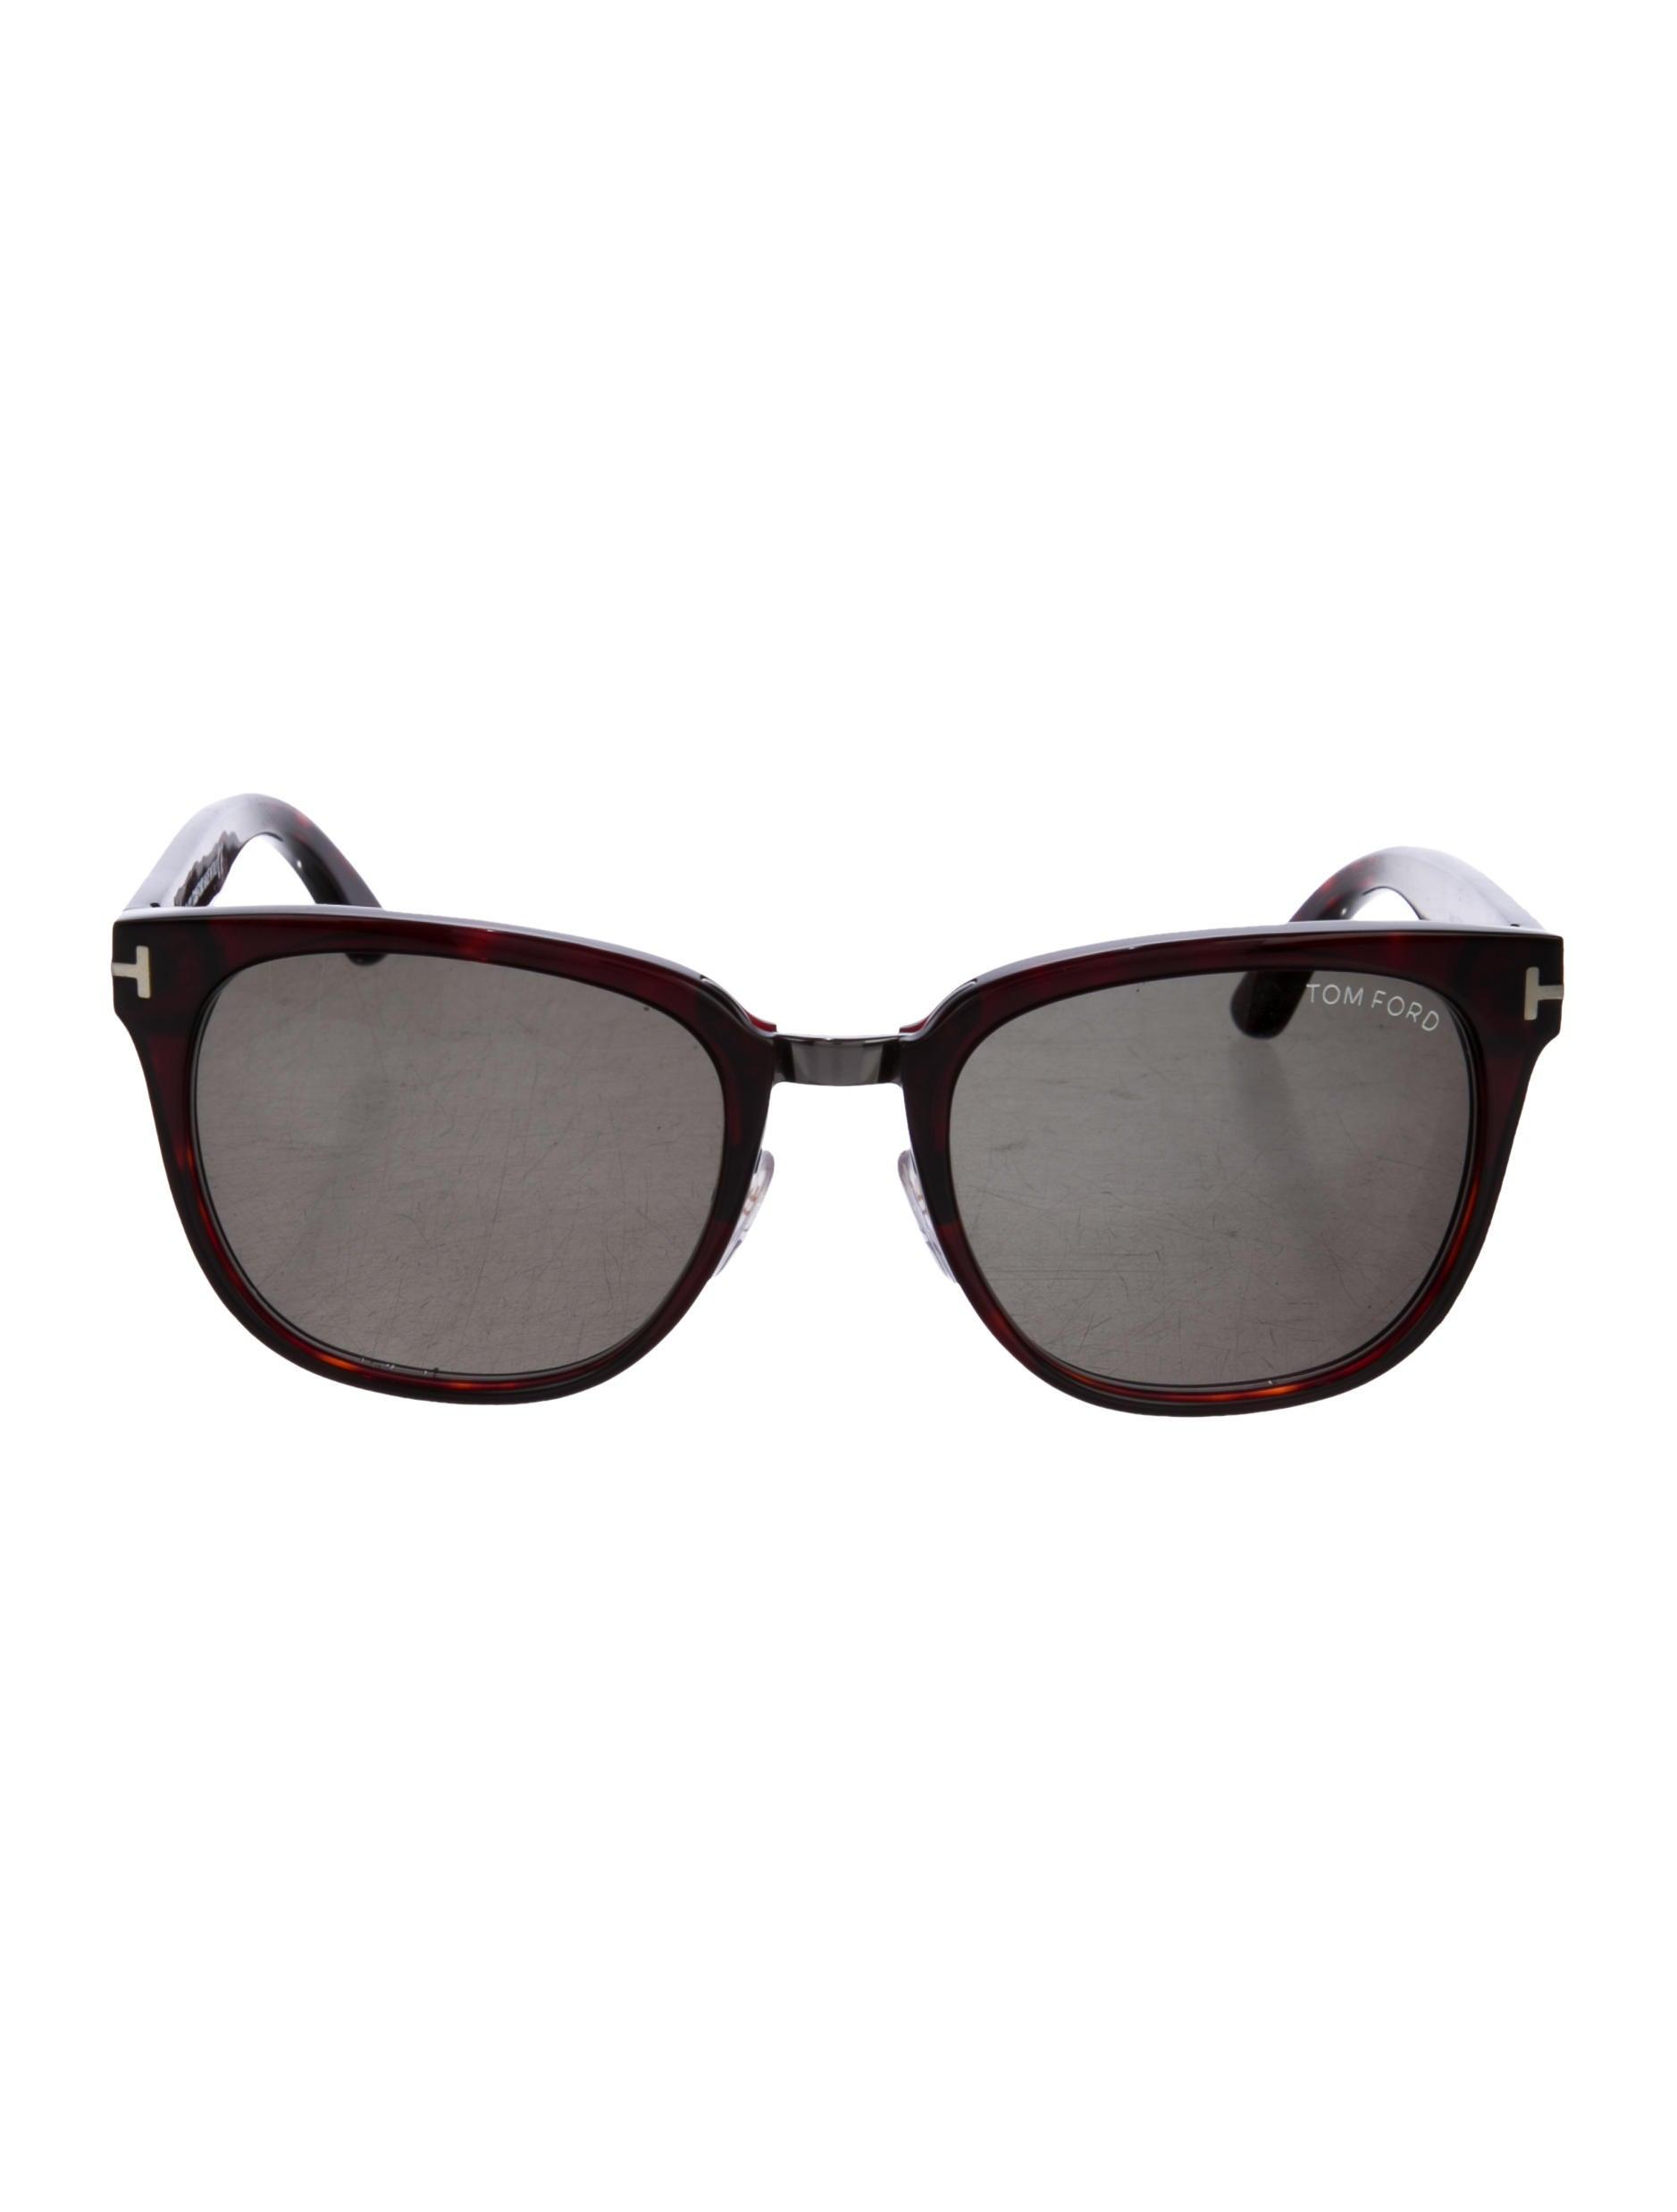 Tom Ford Rock Wayfarer Sunglasses - Accessories - TOM36682 | The RealReal